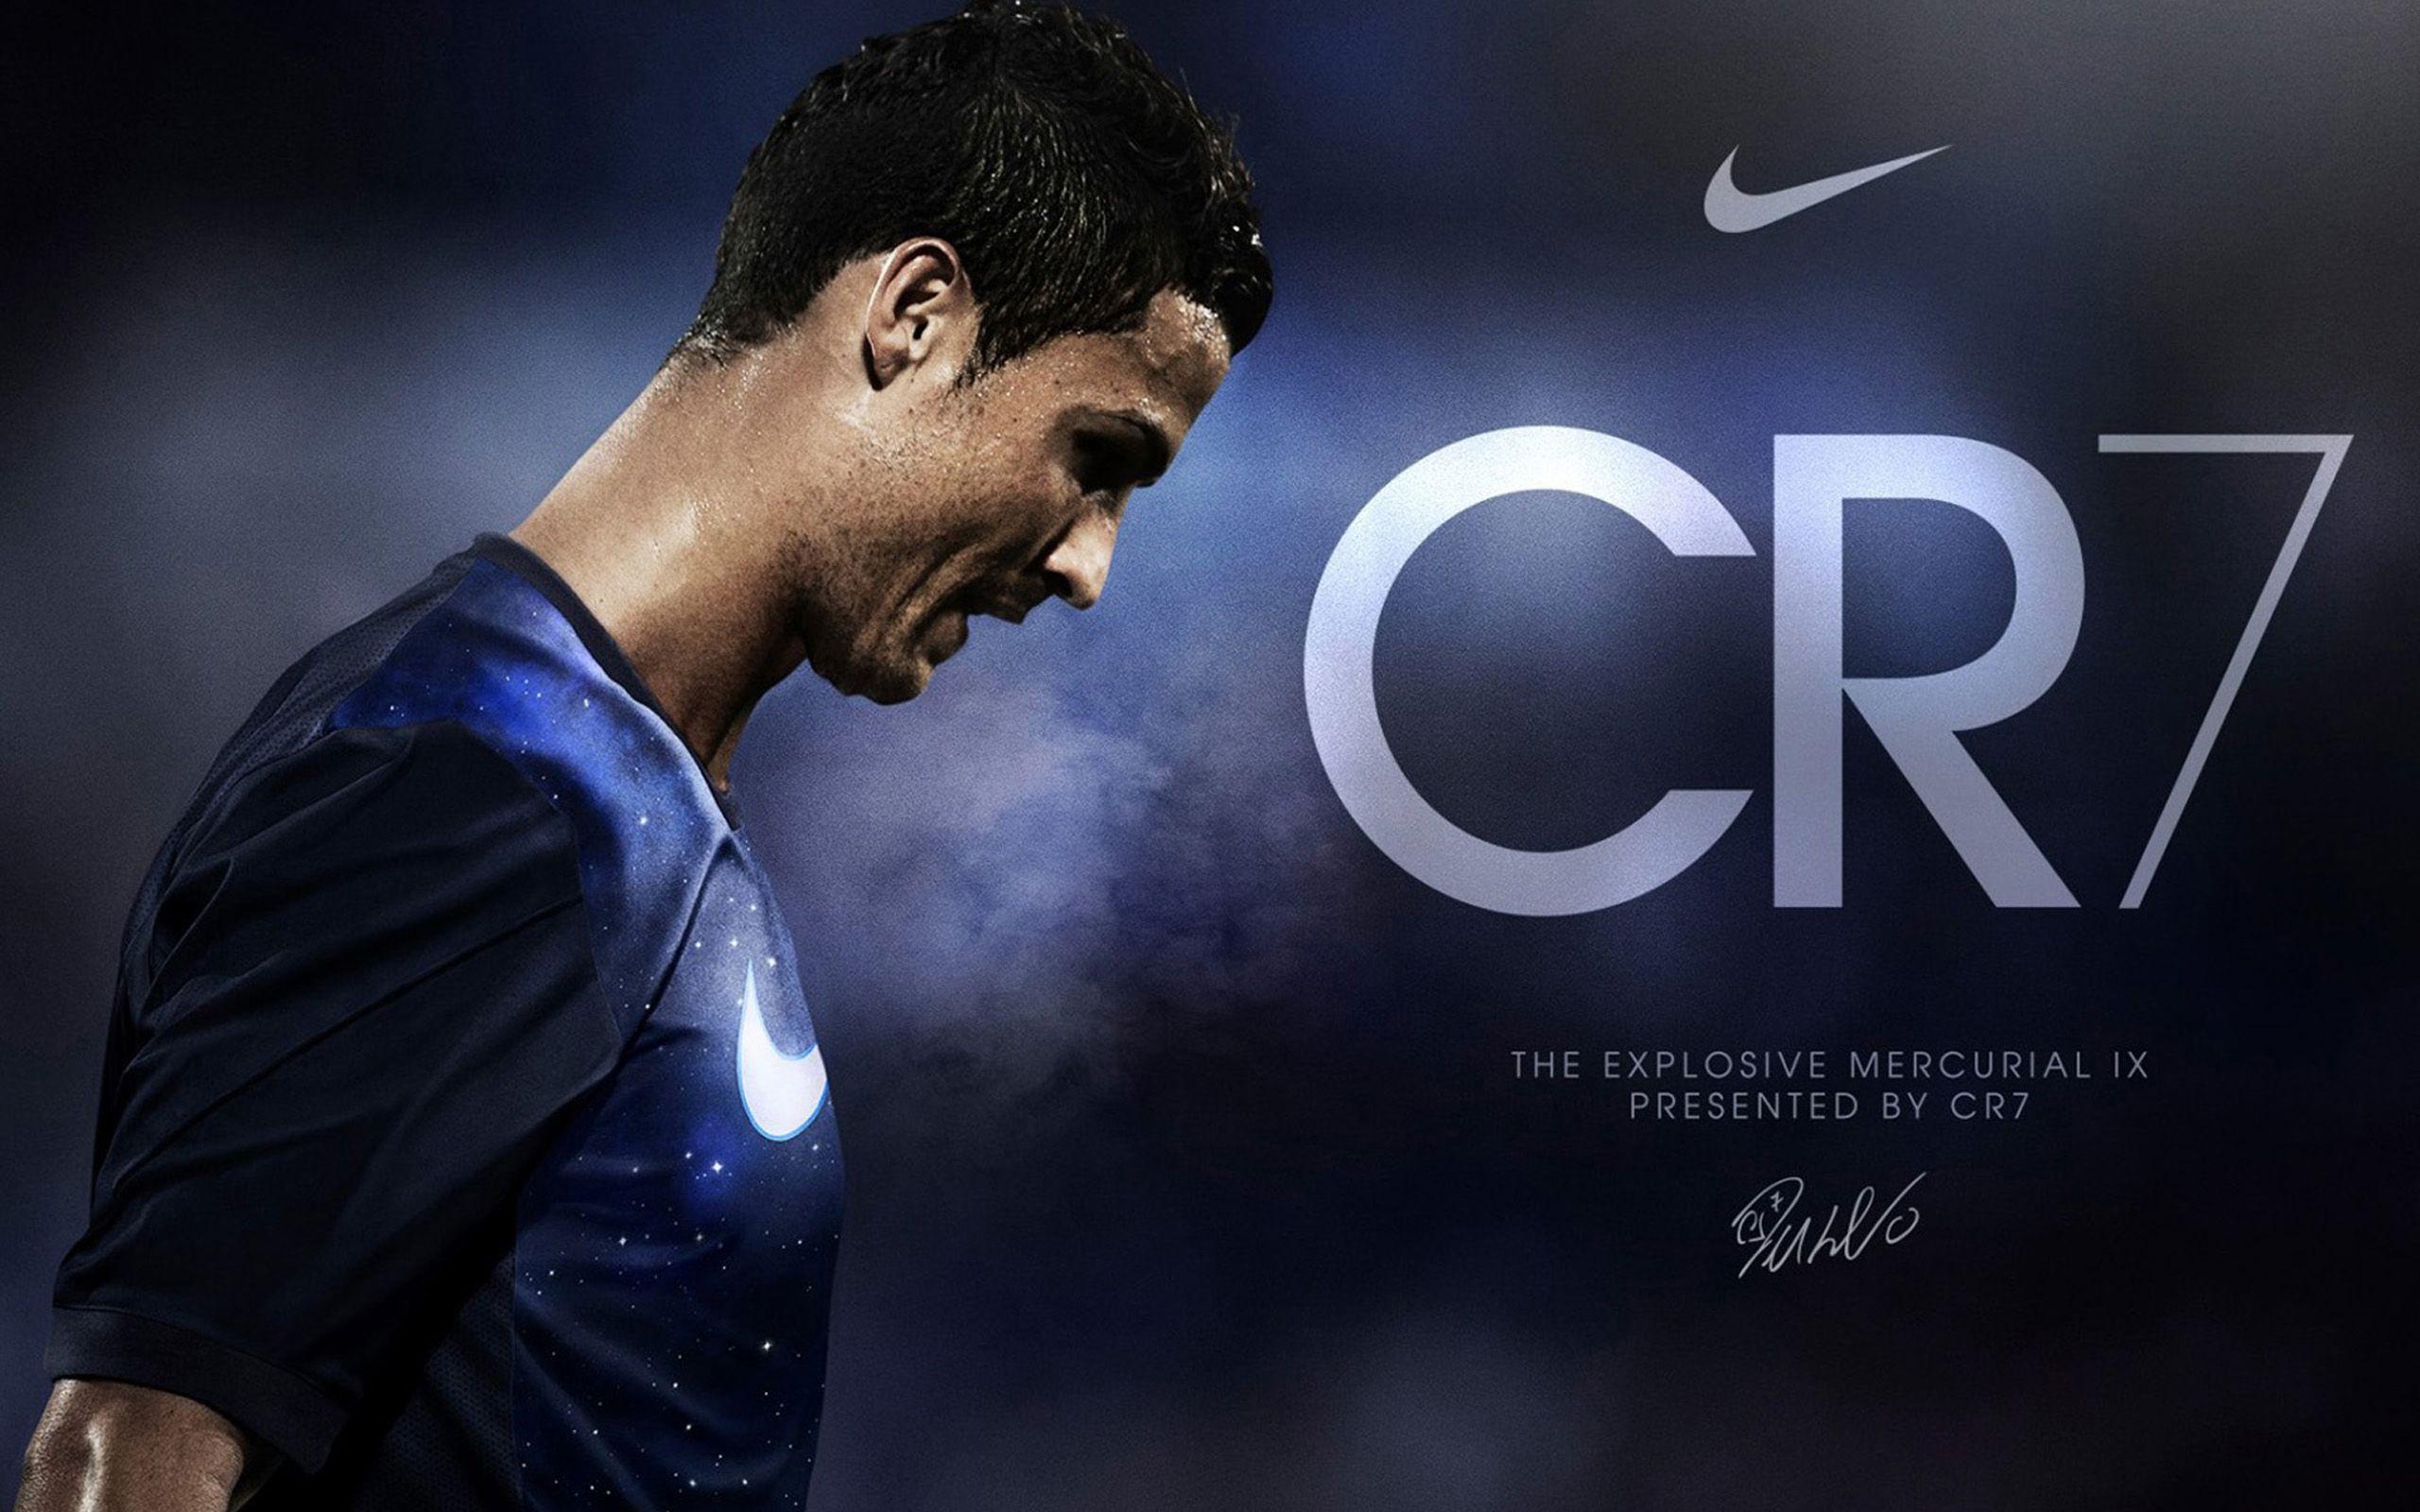 Image For Cristiano Ronaldo Wallpaper 2015 Football